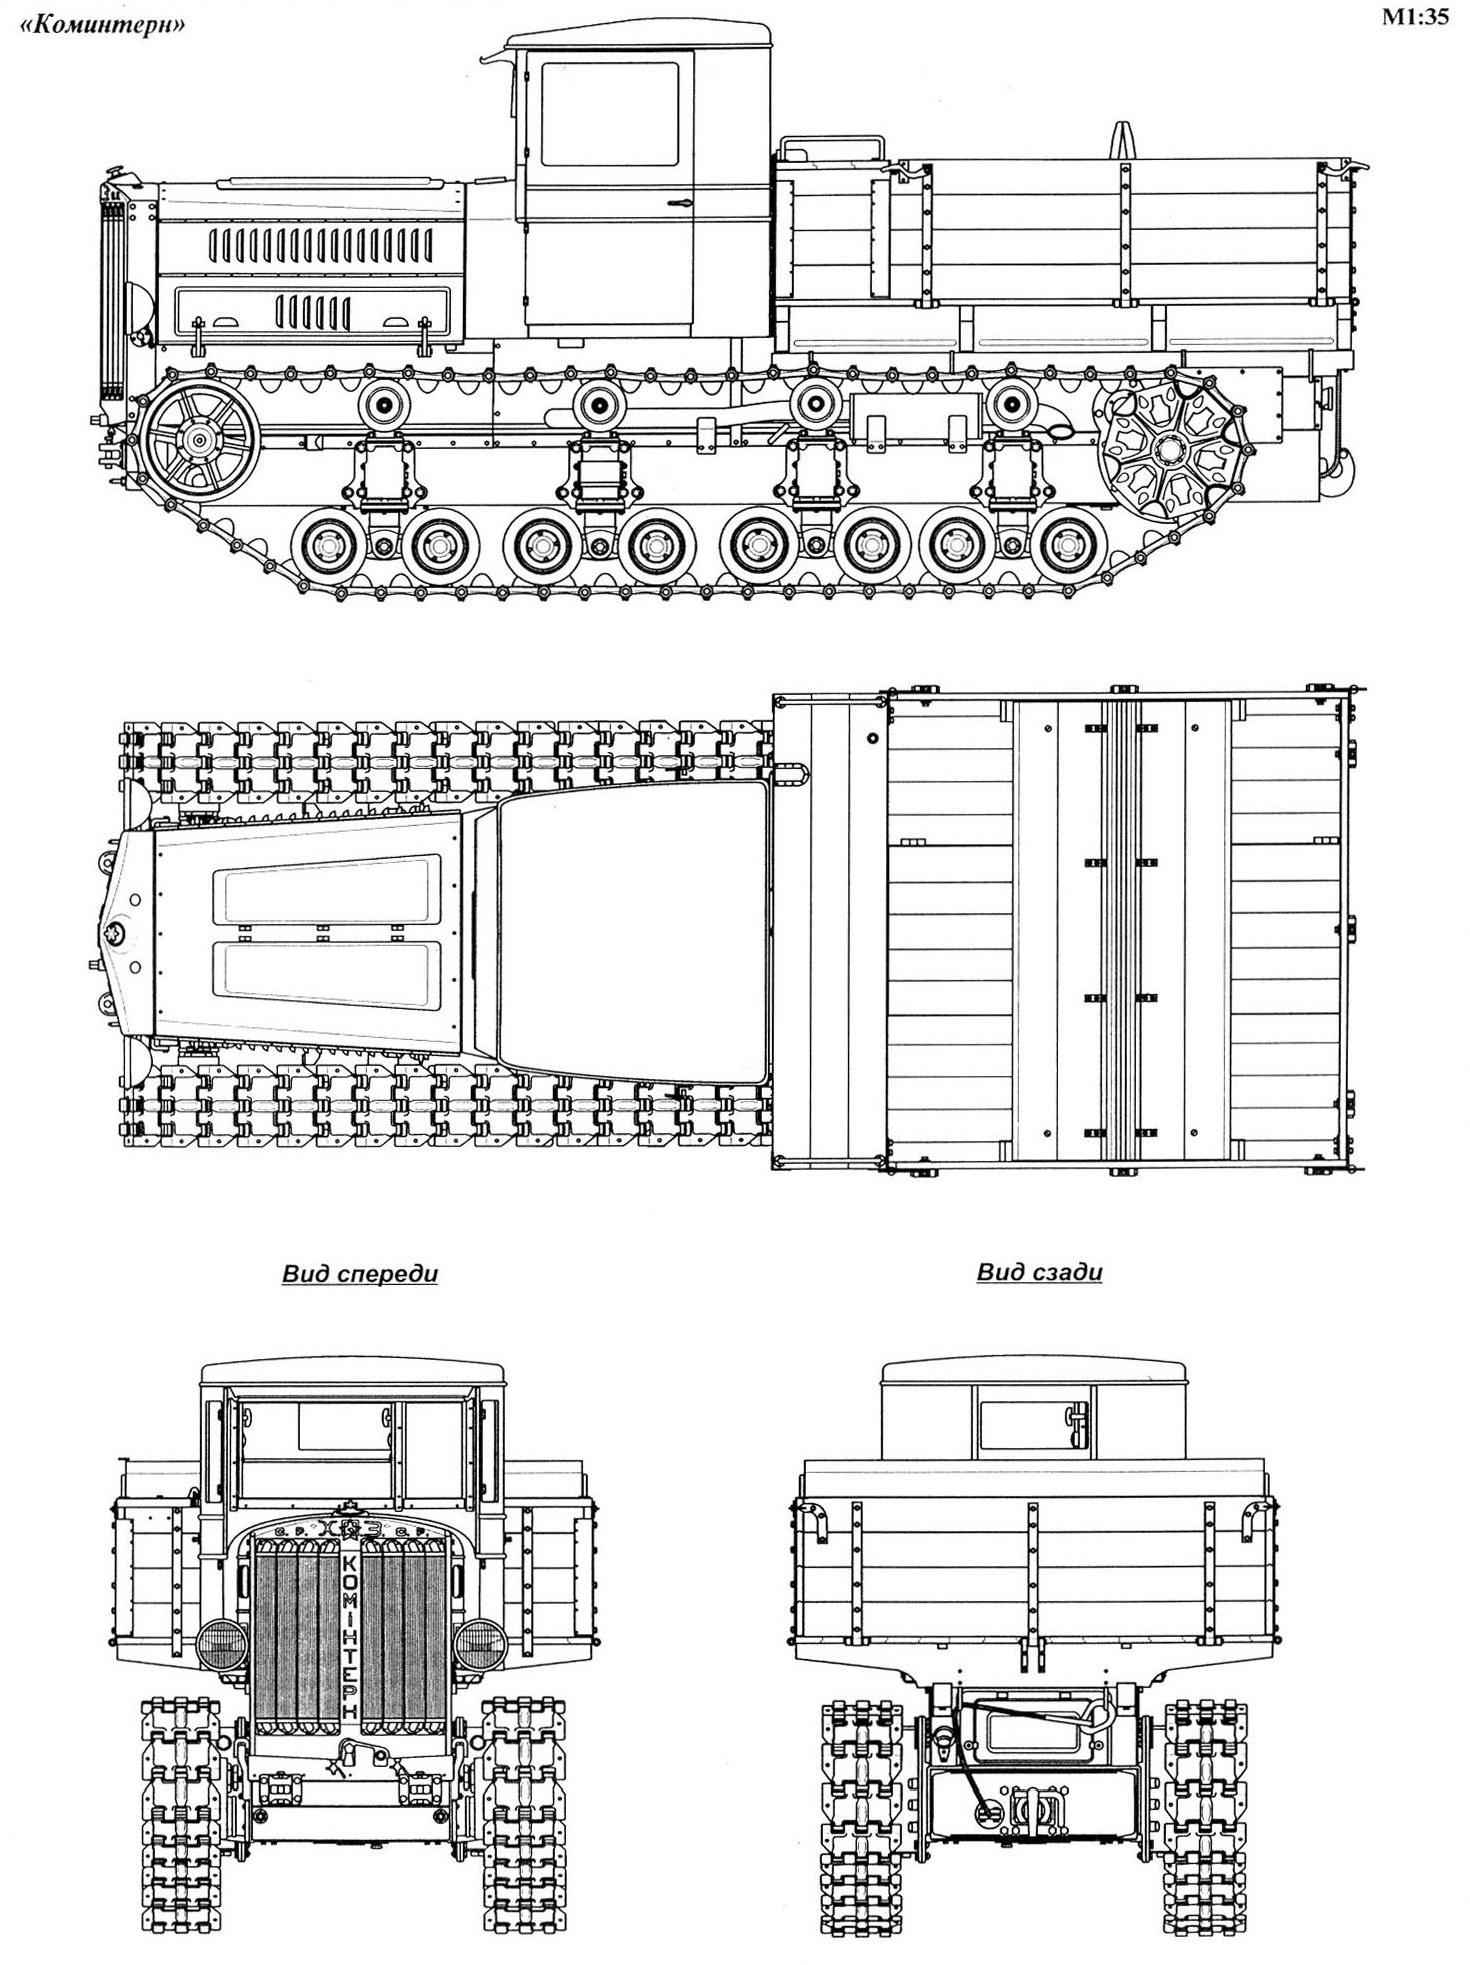 Auxiliary Vehicles Blueprints